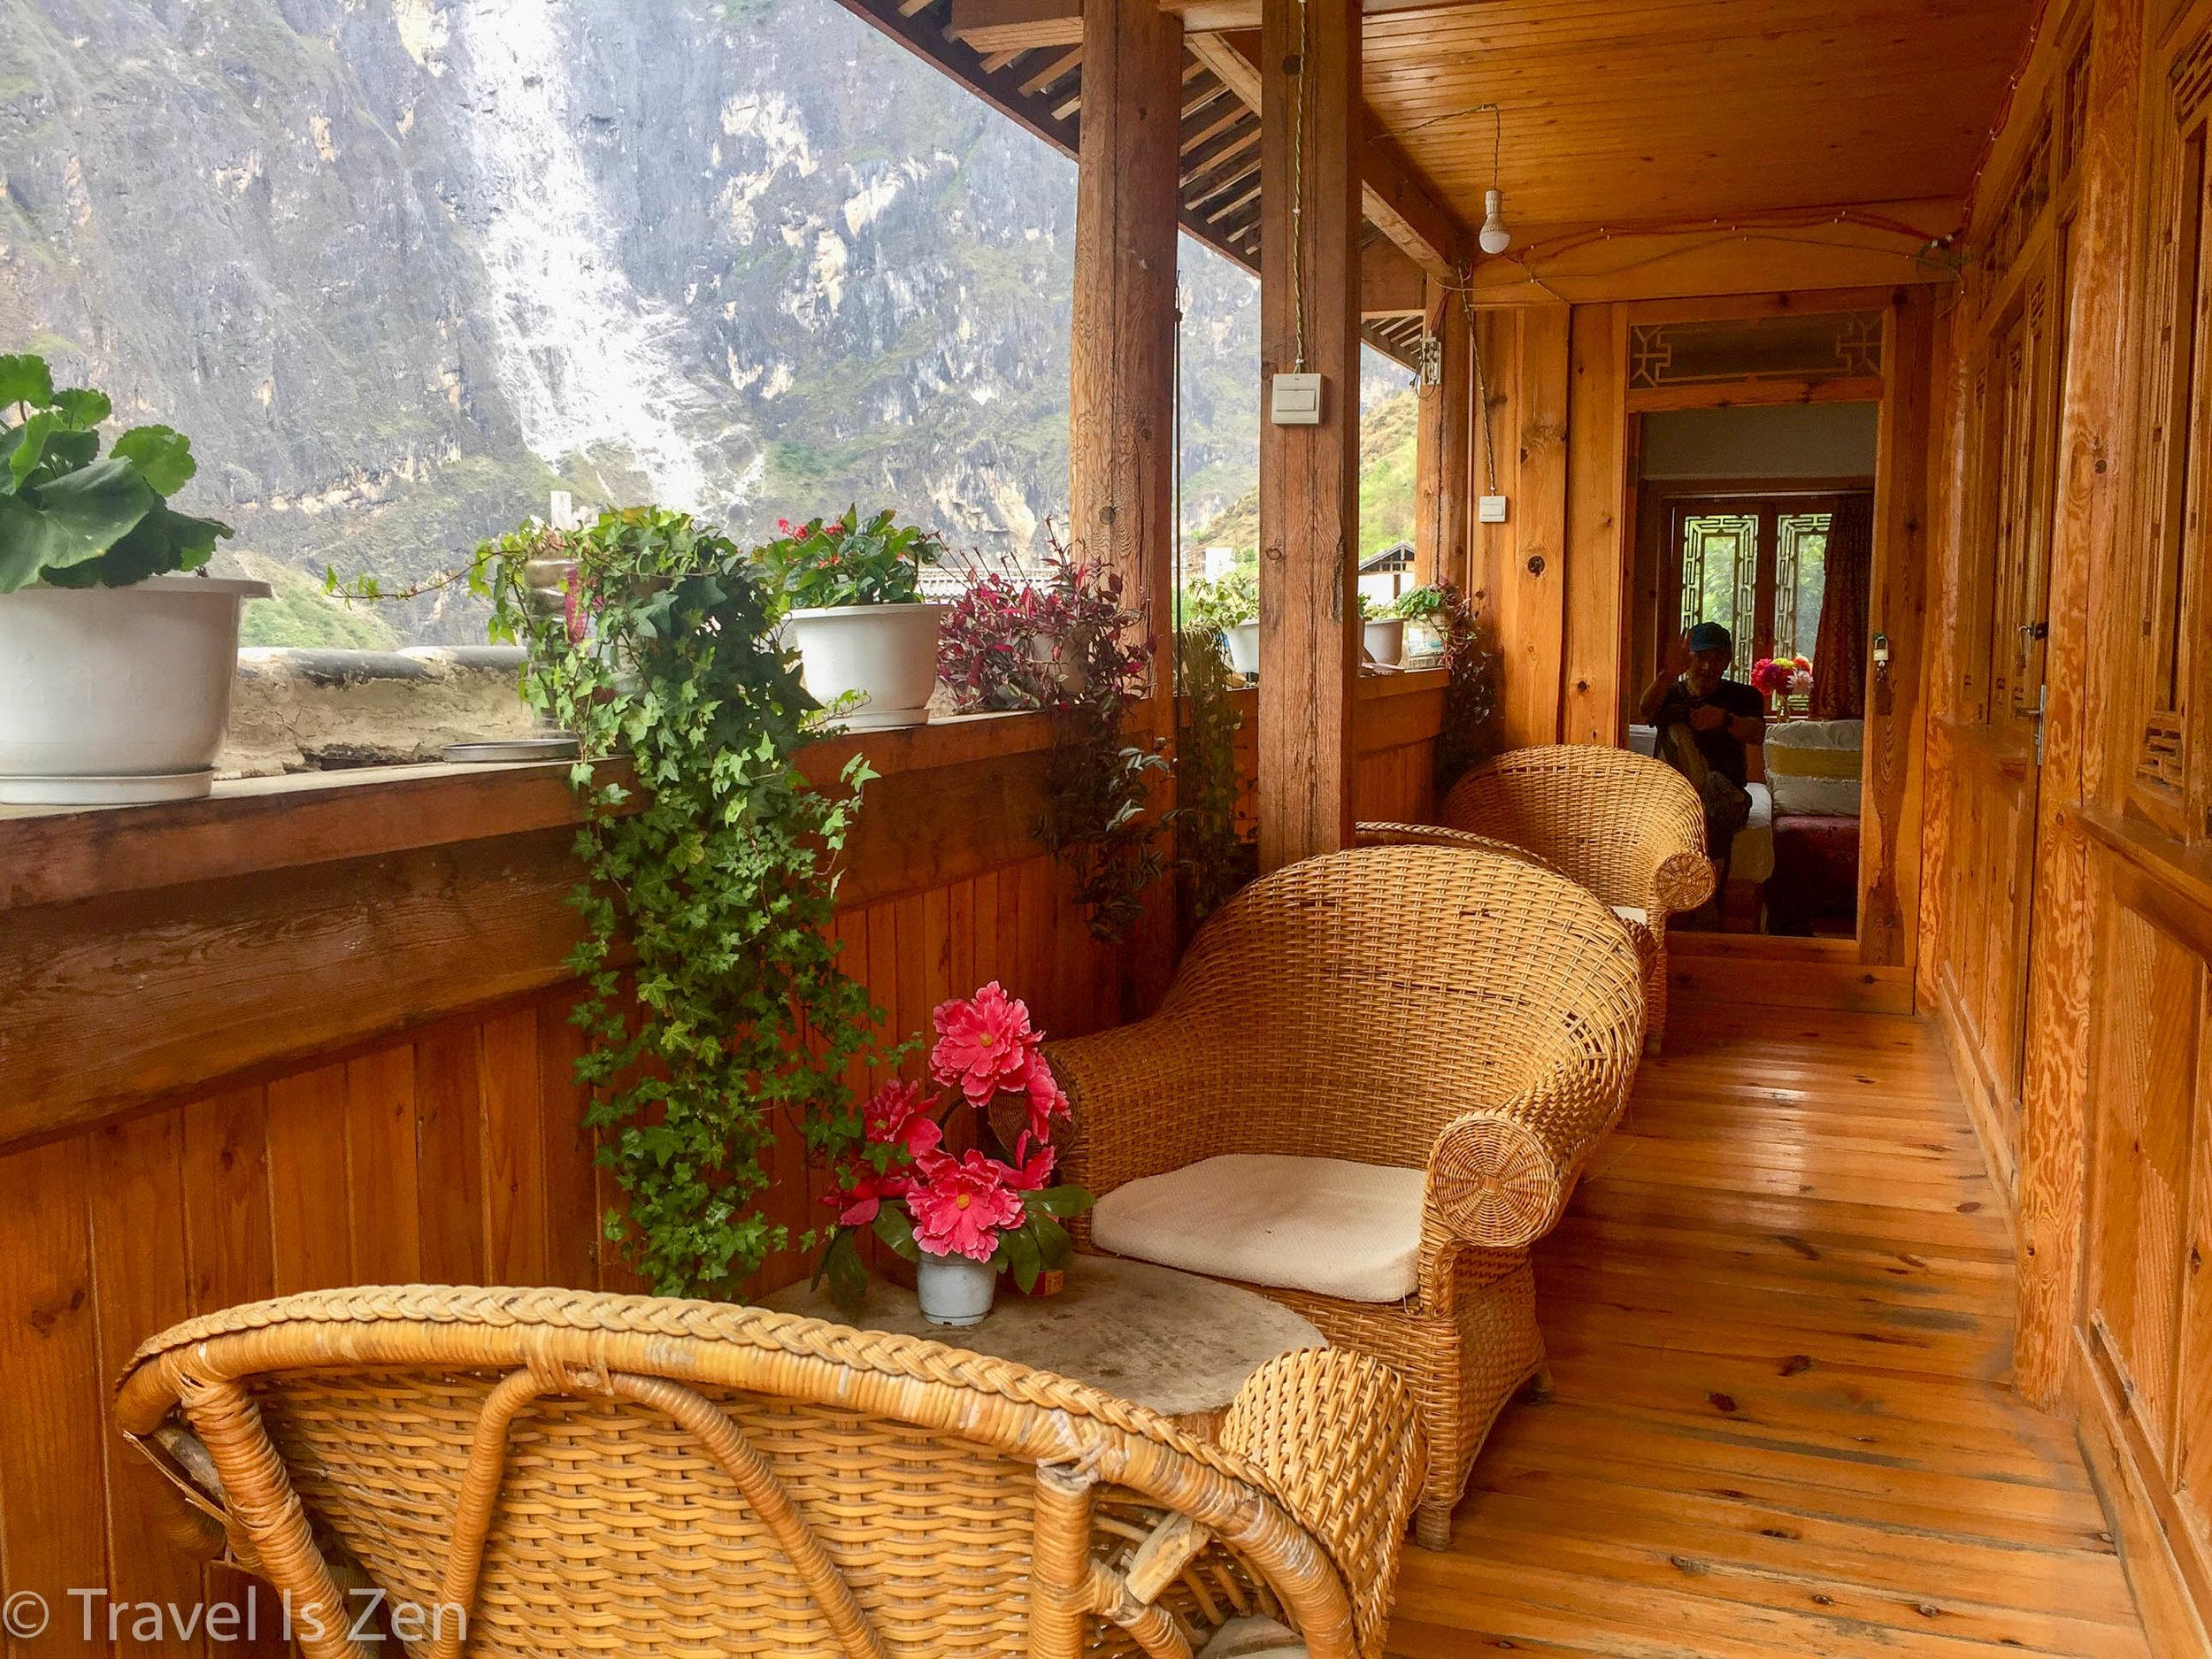 Relaxing at Tibet House